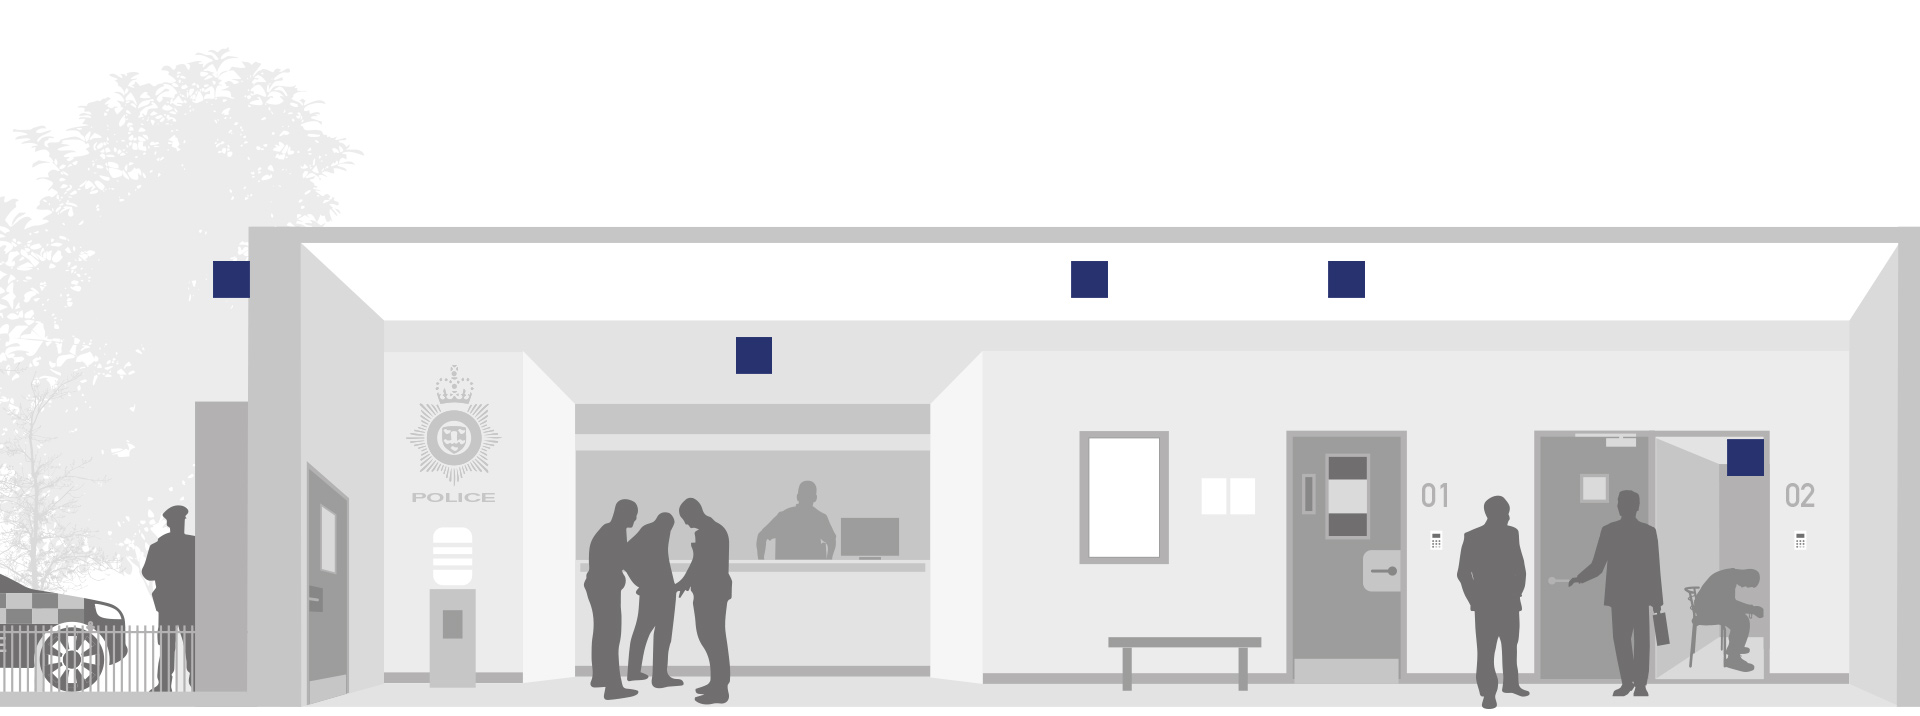 Illustration_Policestation